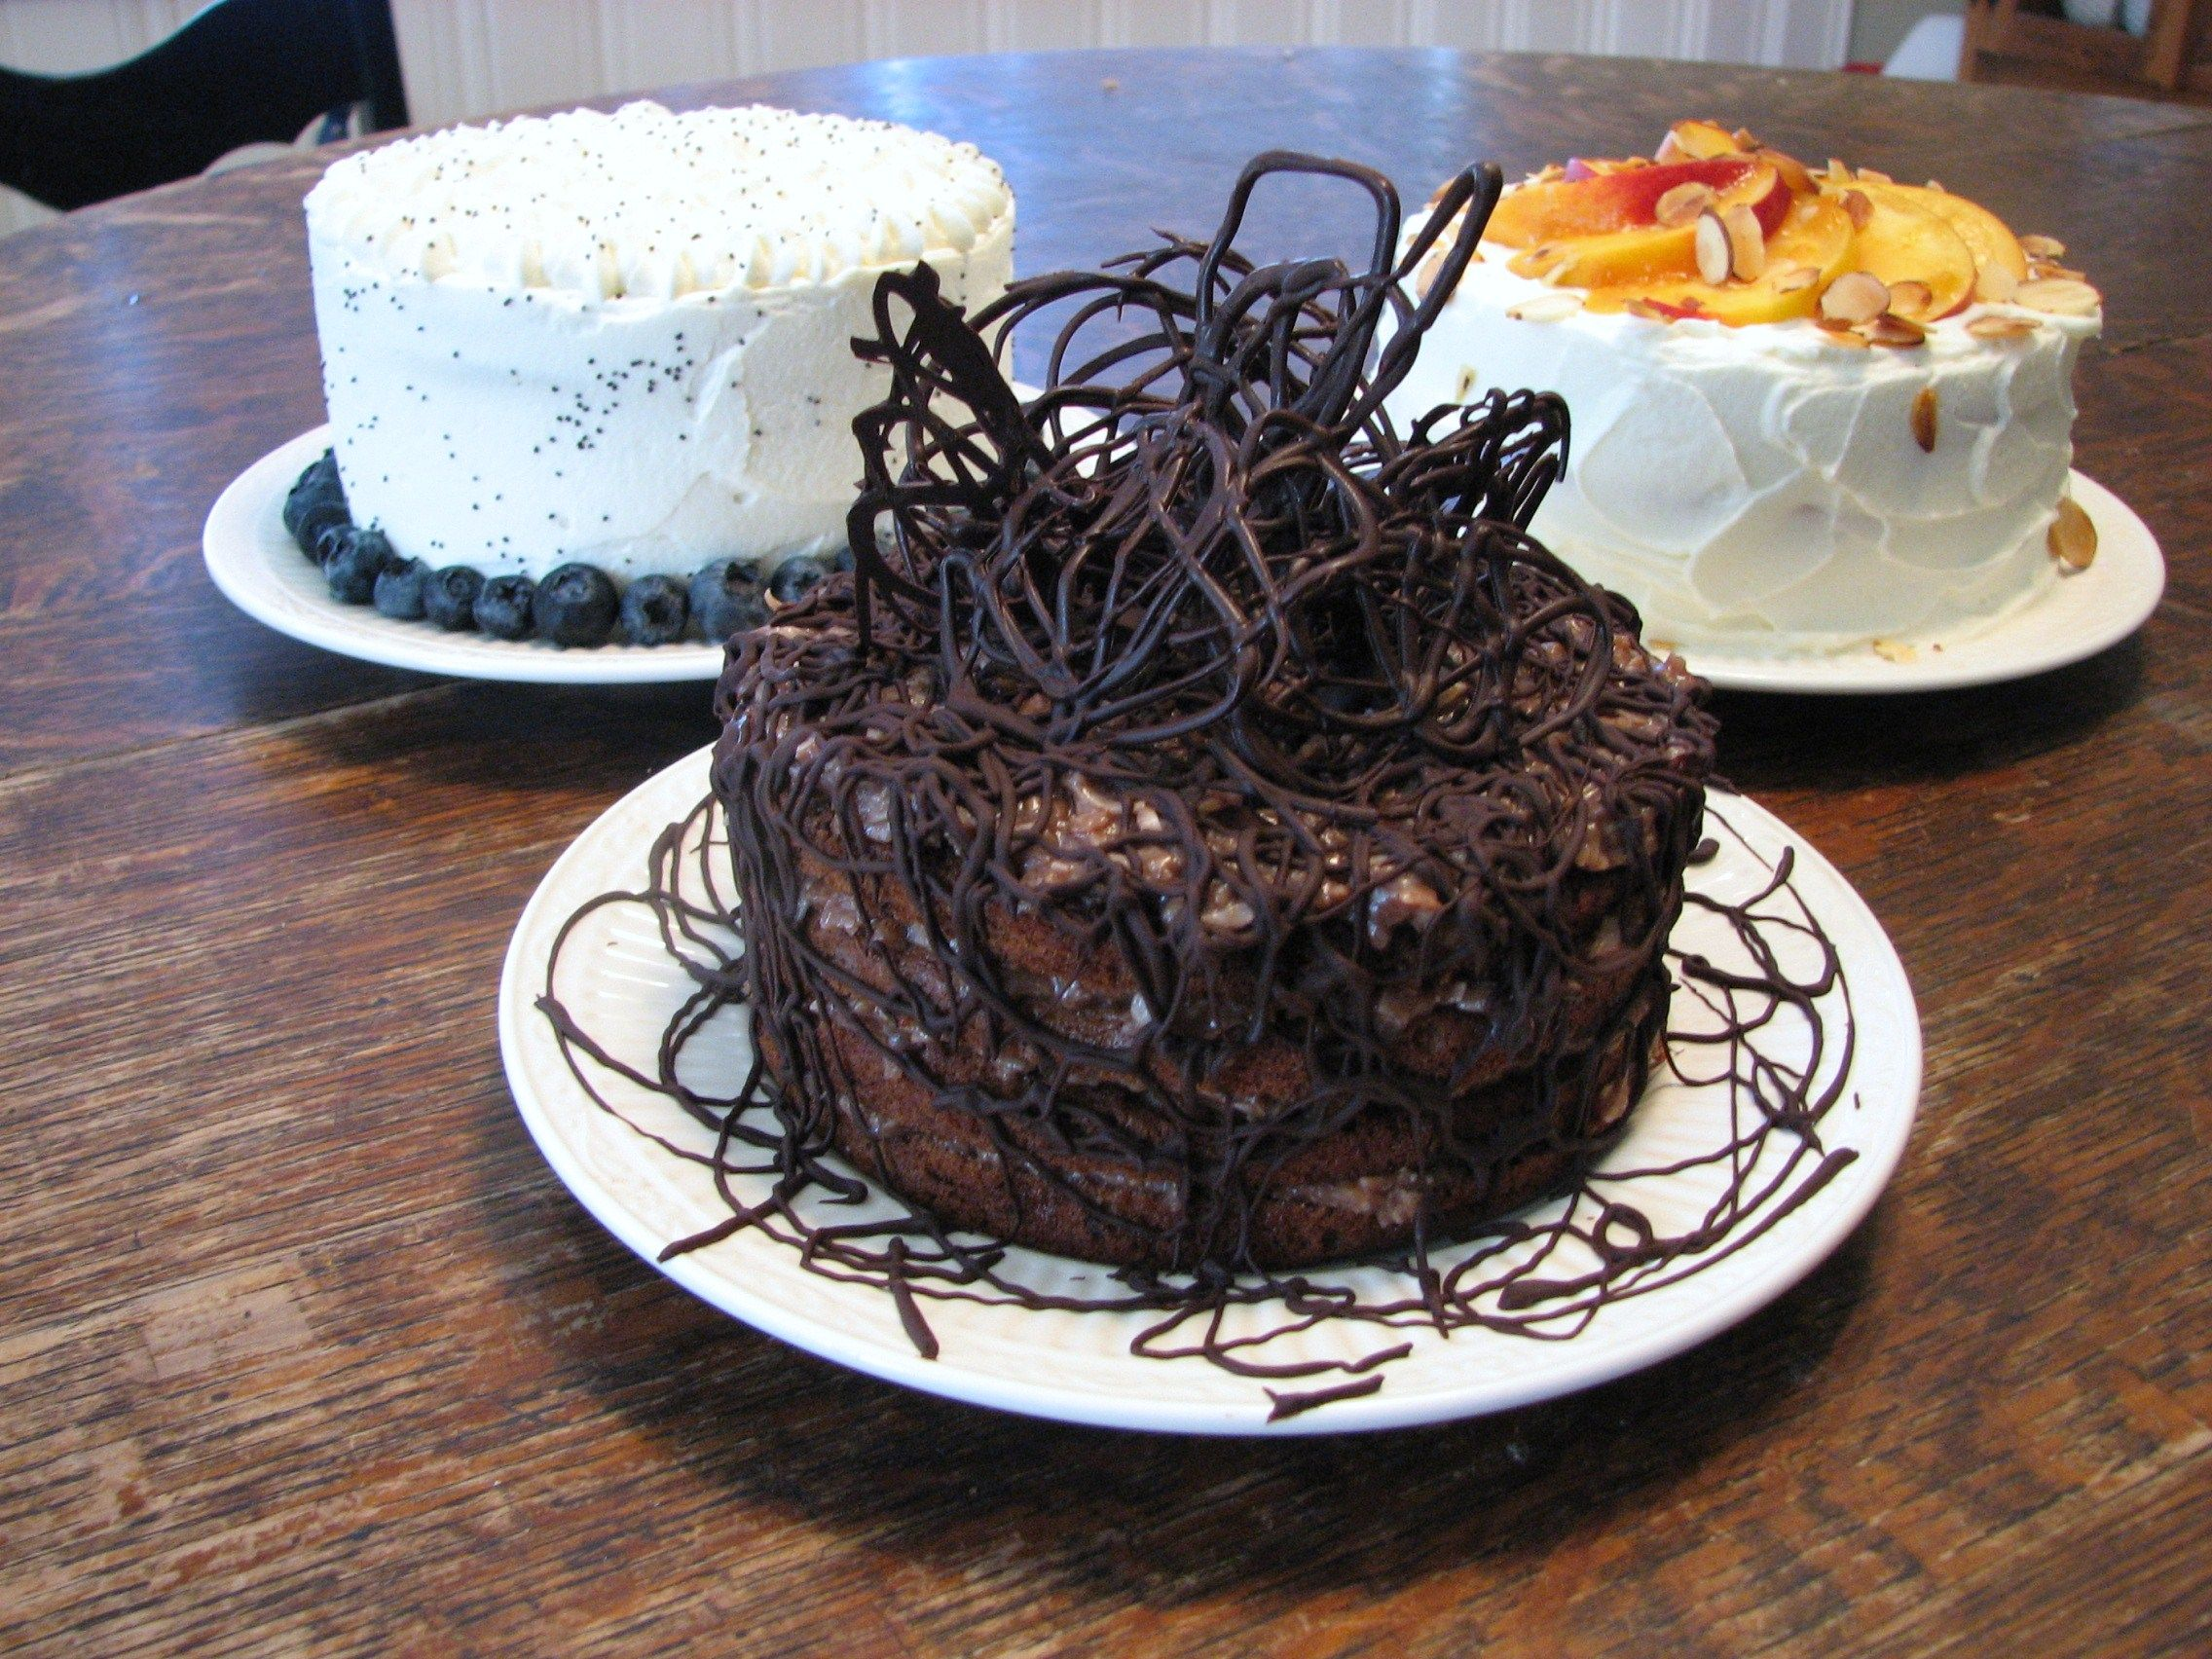 3 mini birthday cakes German Chocolate with chocolate drizzle